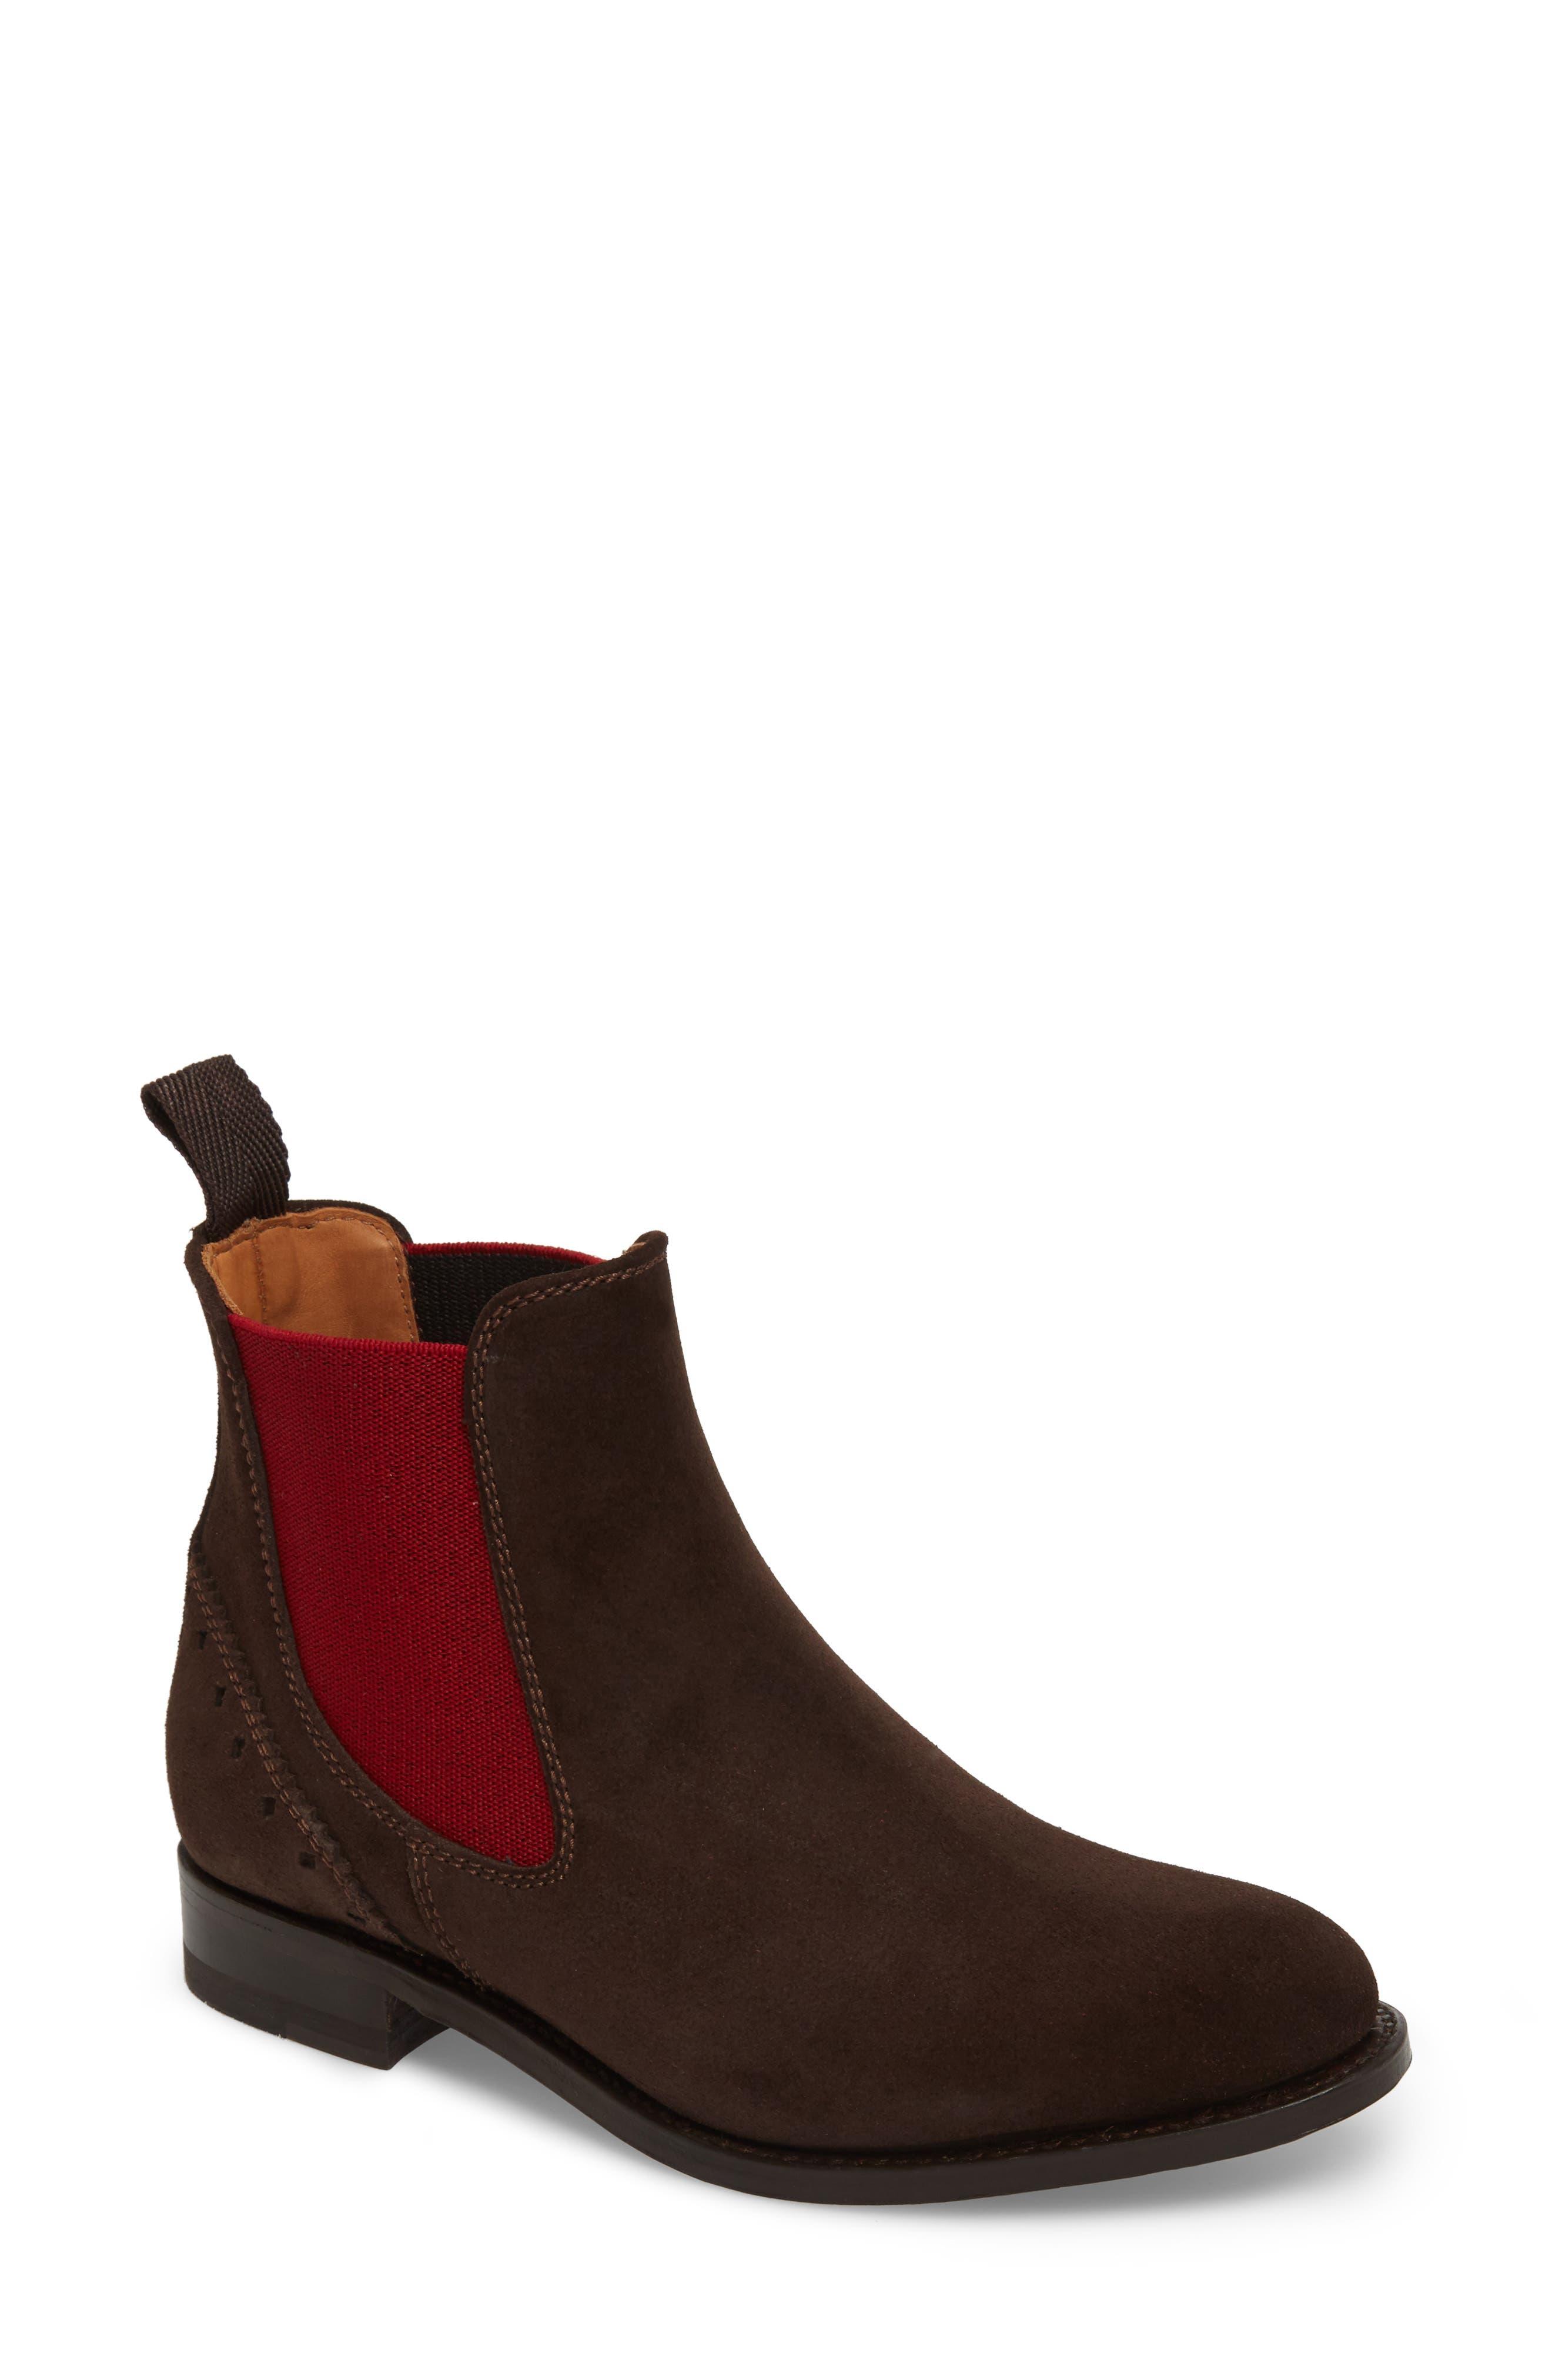 Benissa Lux Chelsea Boot,                             Main thumbnail 1, color,